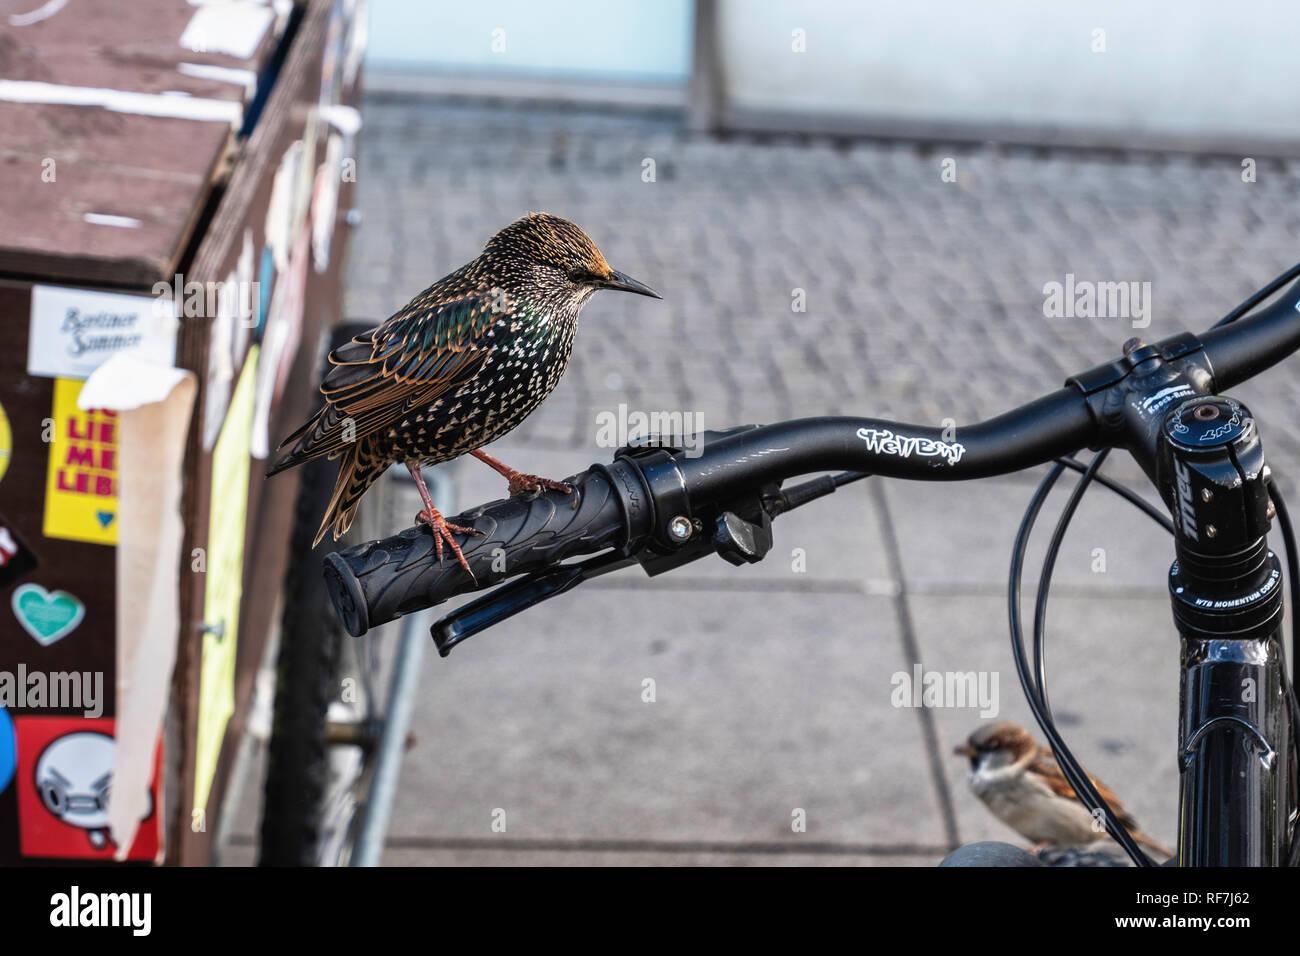 Urban bird, Common starling,sturnus vulgaris, sitting on the handlebars of a bicycle - Stock Image